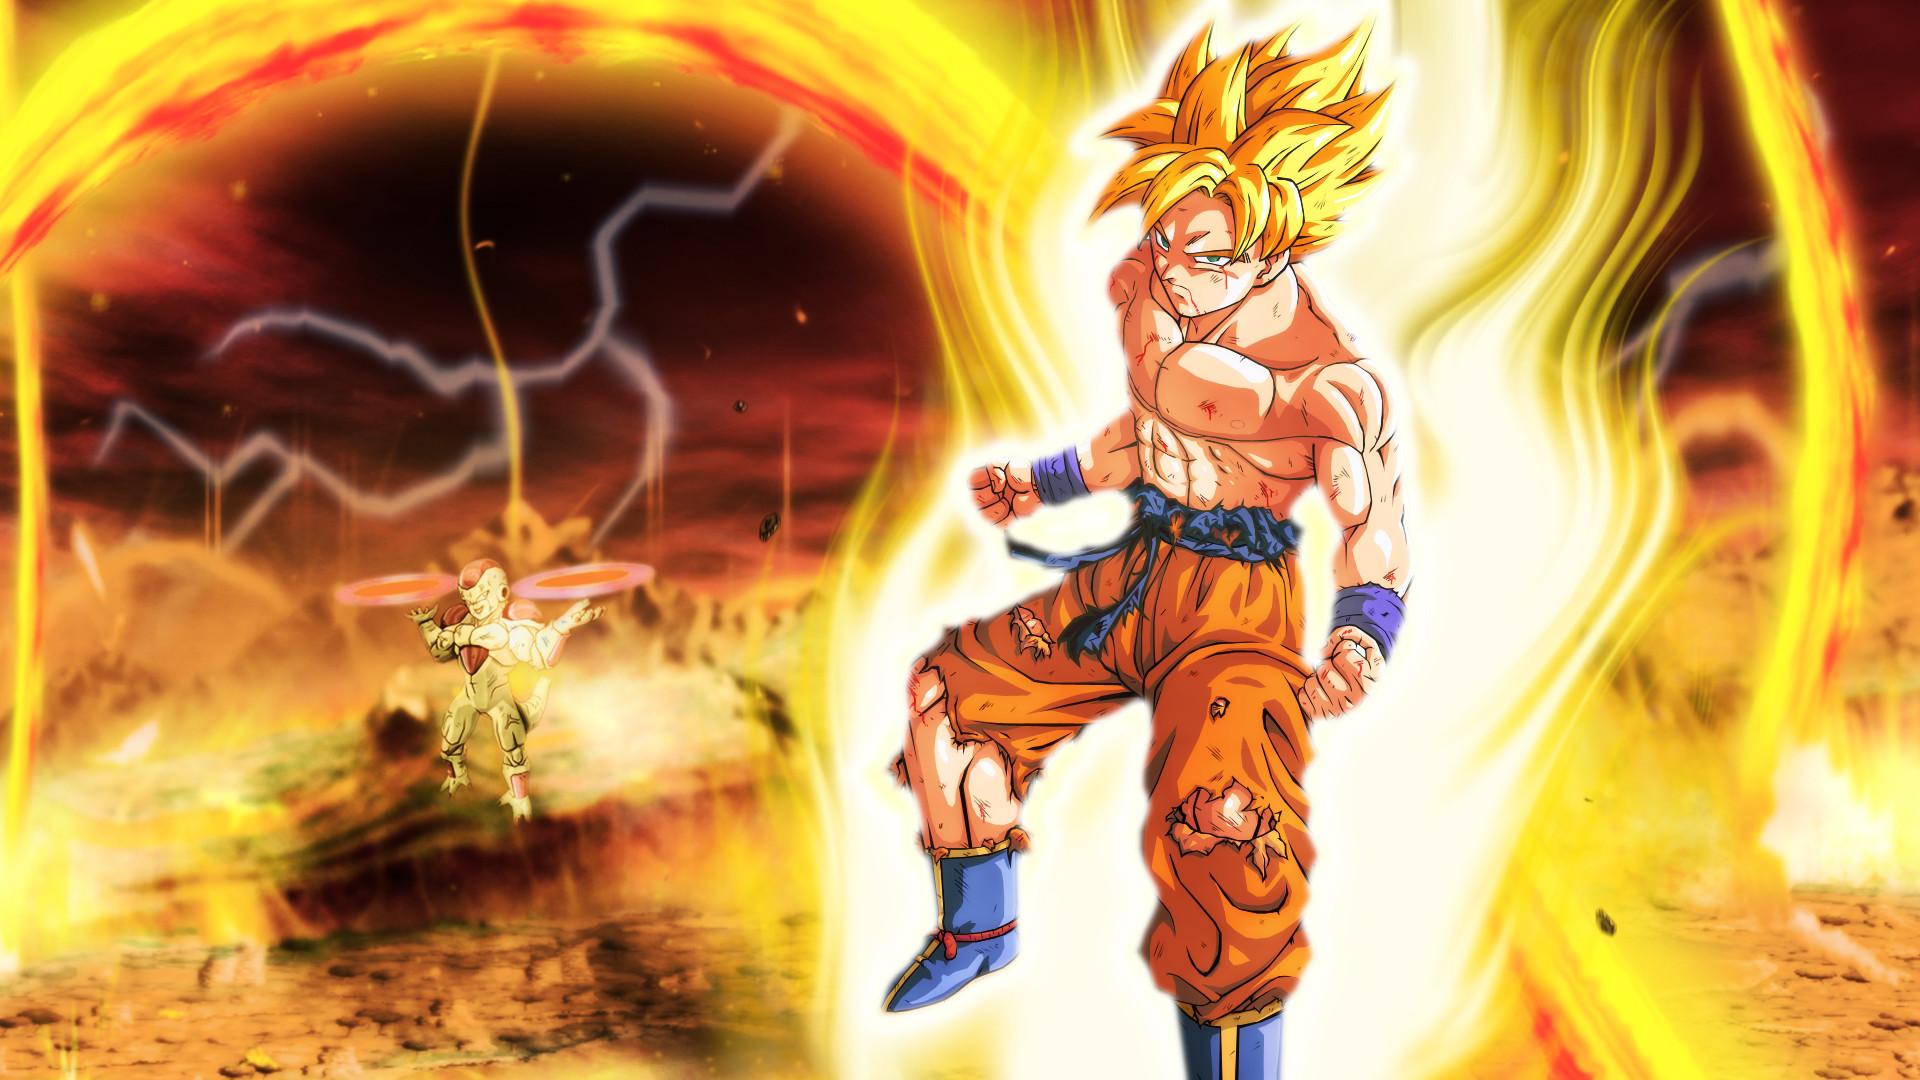 Res: 1920x1080, Billysan291 30 2 Goku vs Frieza Final Round HD by Billysan291